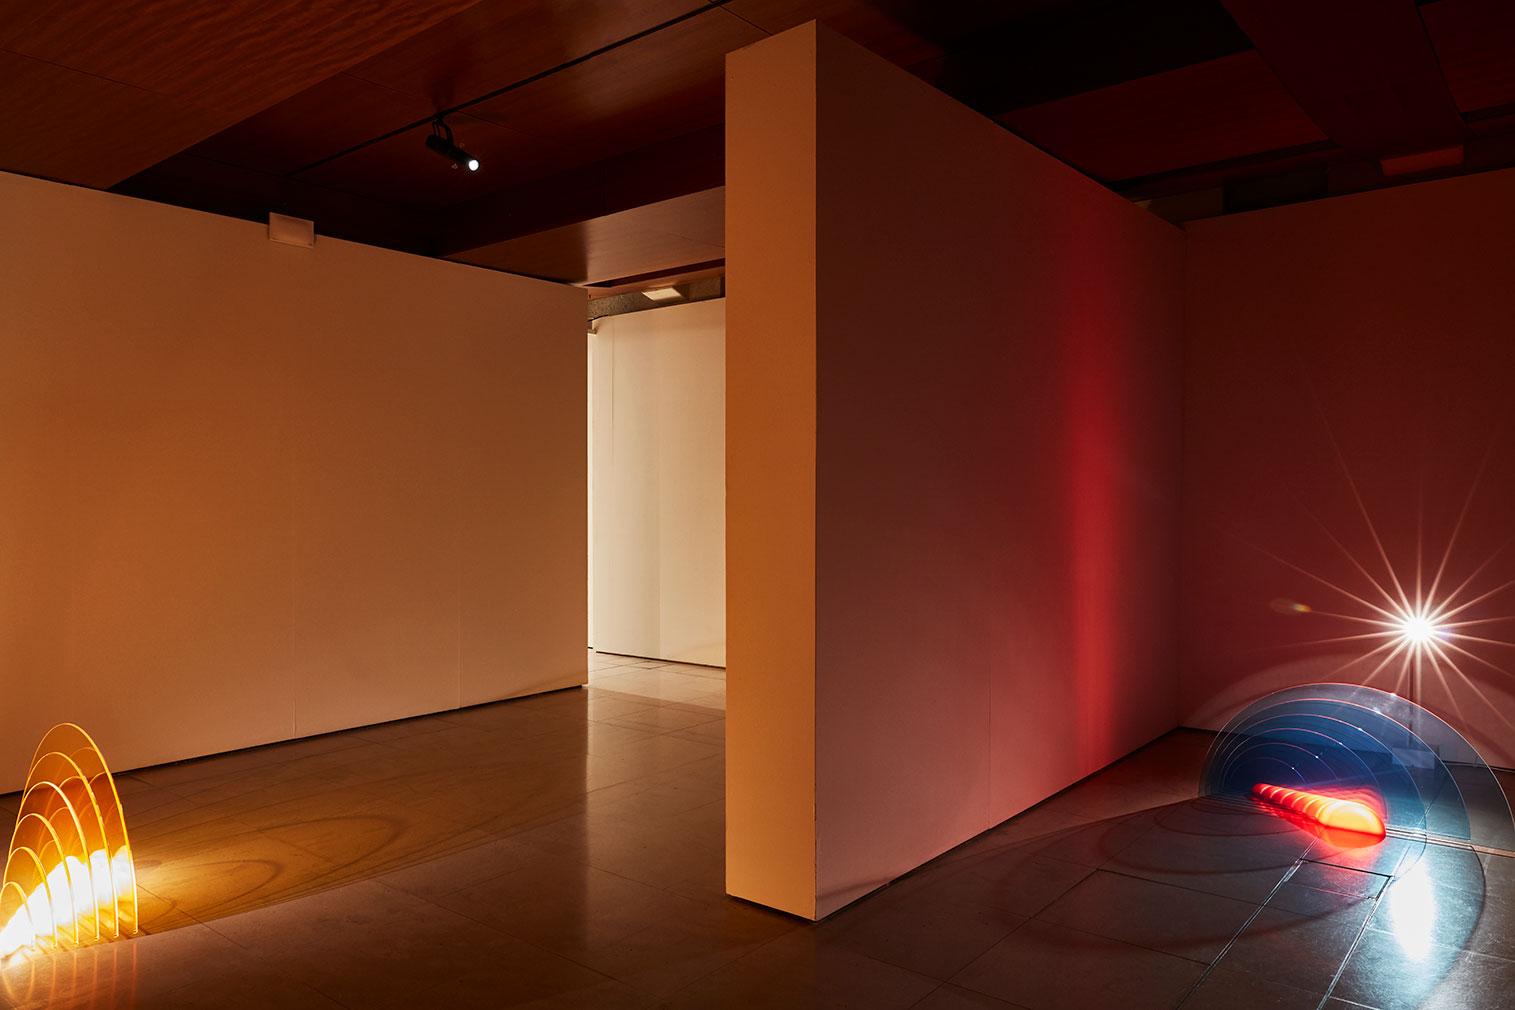 Haberdashery Studios' installation at London Design Biennale 2018